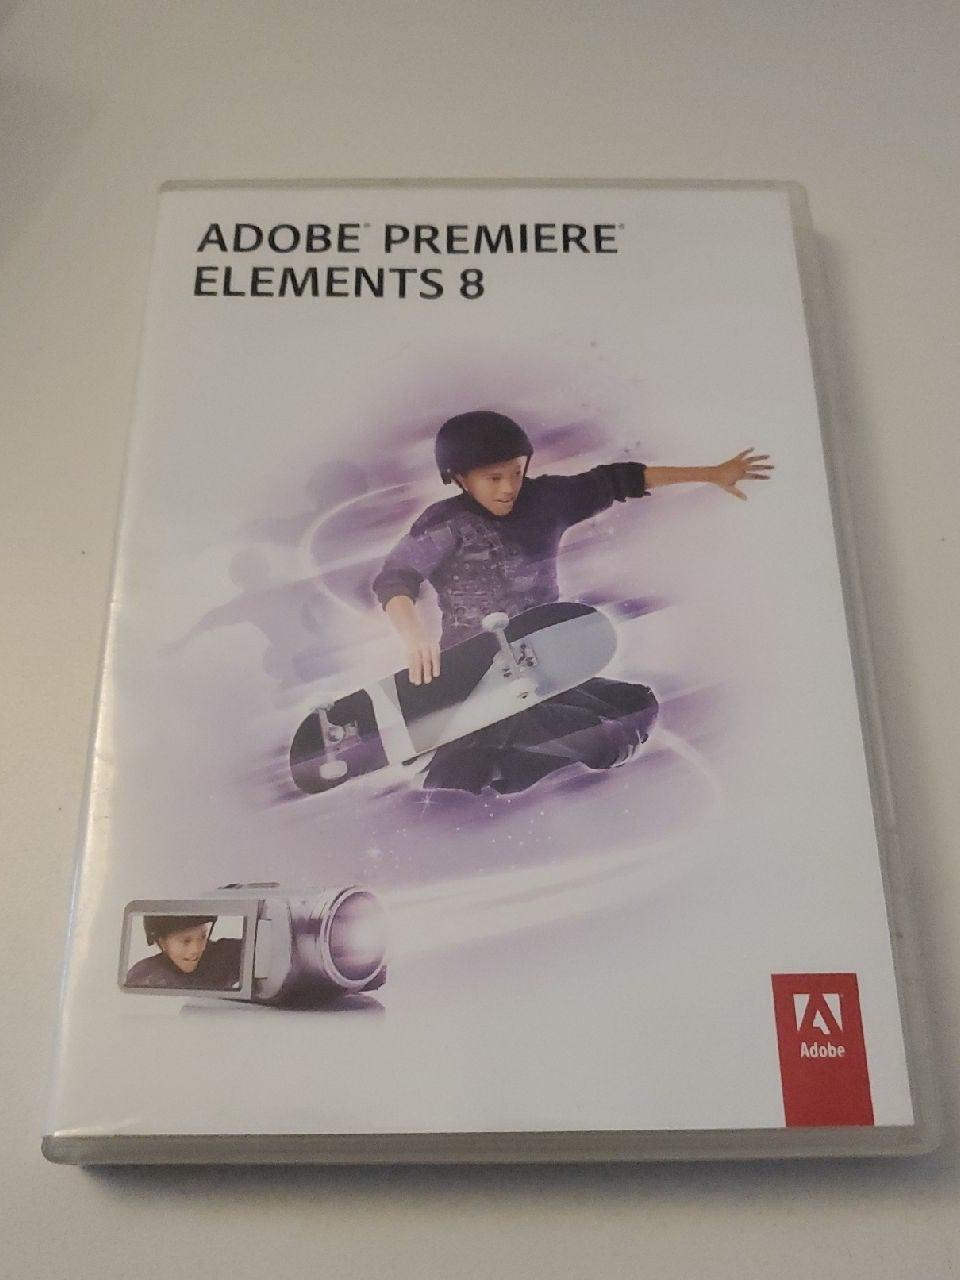 Adobe Premier Elements 8 - Windows